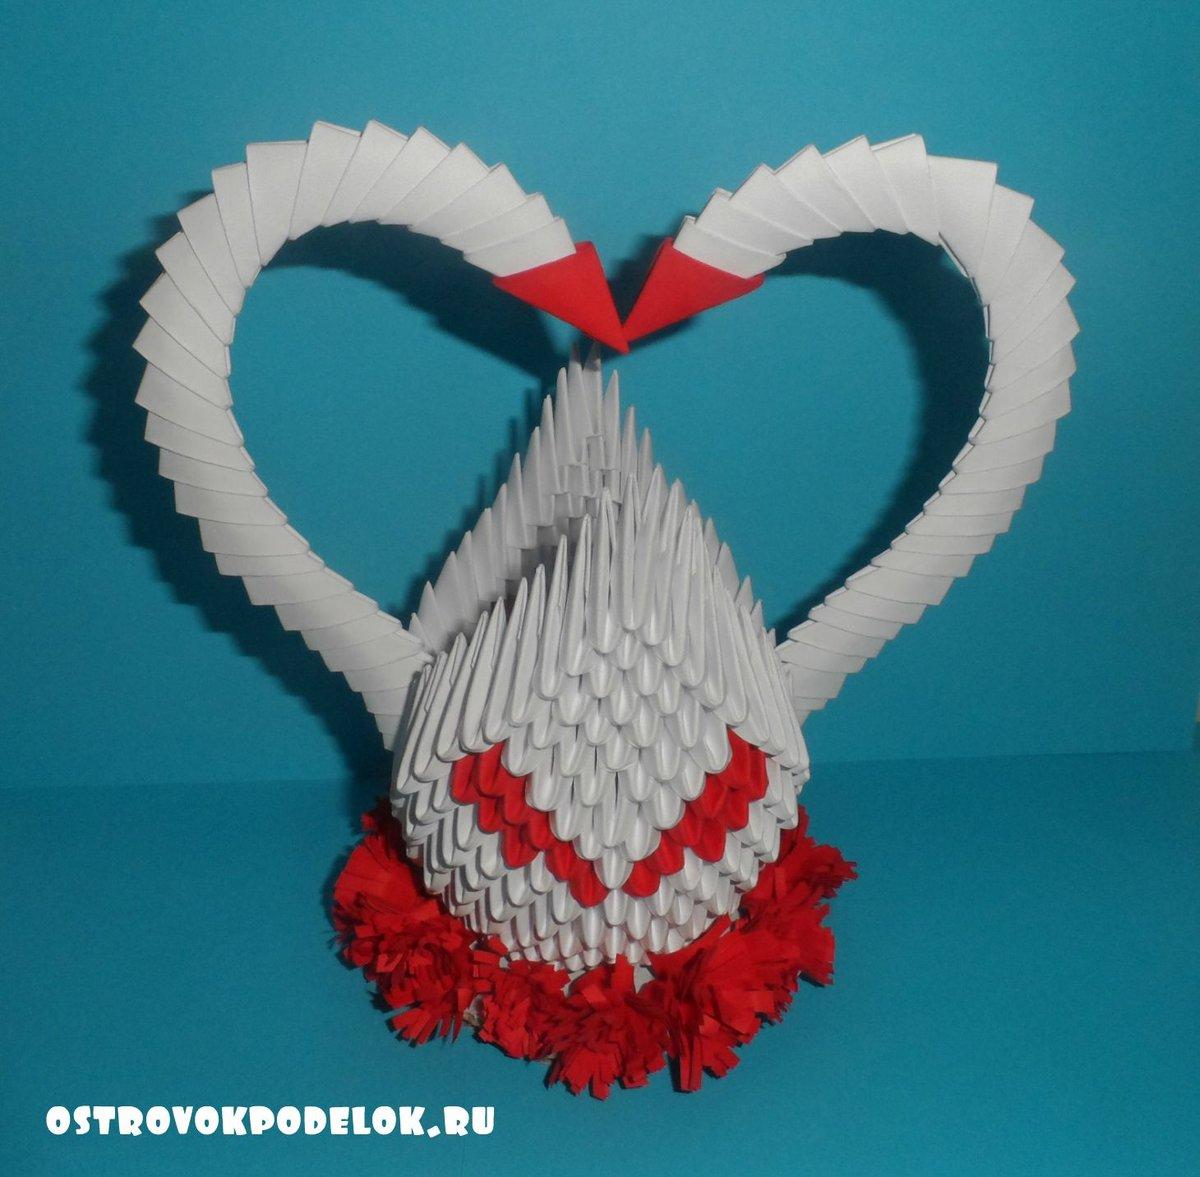 Модульного оригами схема сердца фото 770